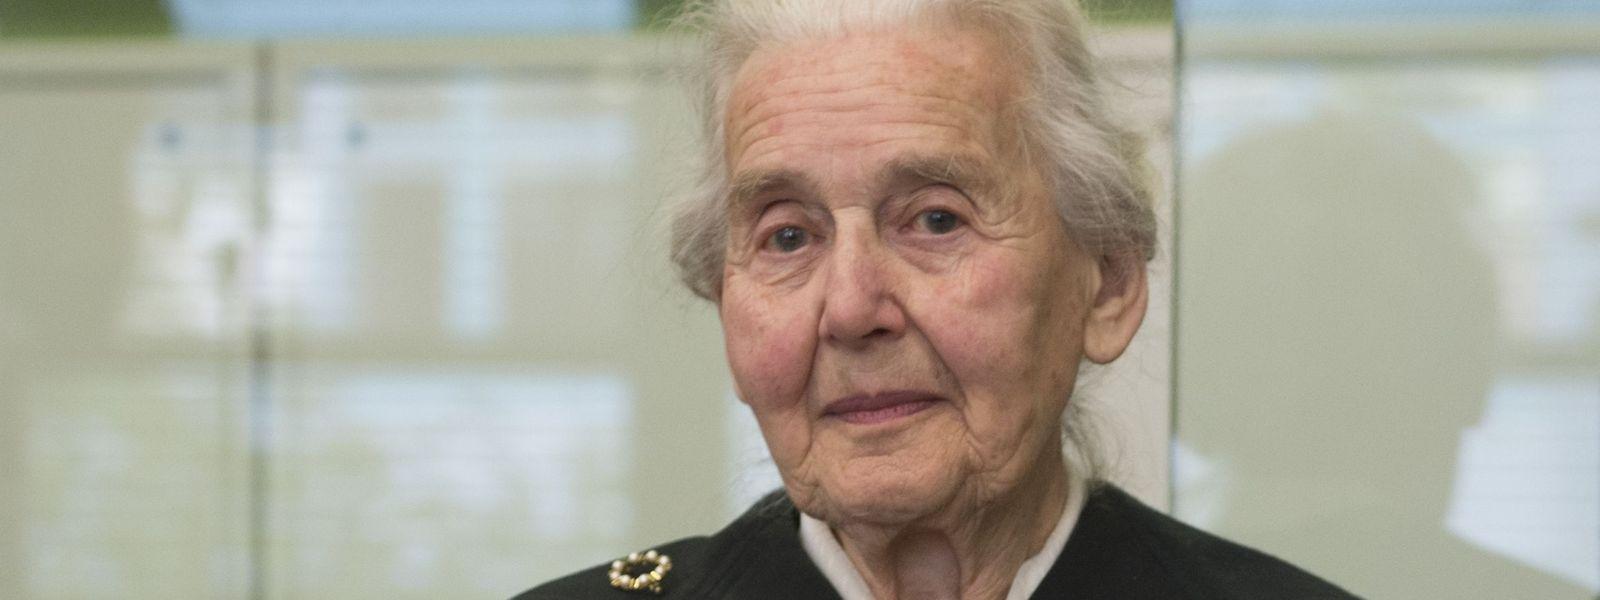 Ursula Haverbeck ist rechtskräftig wegen Volksverhetzung verurteilt.